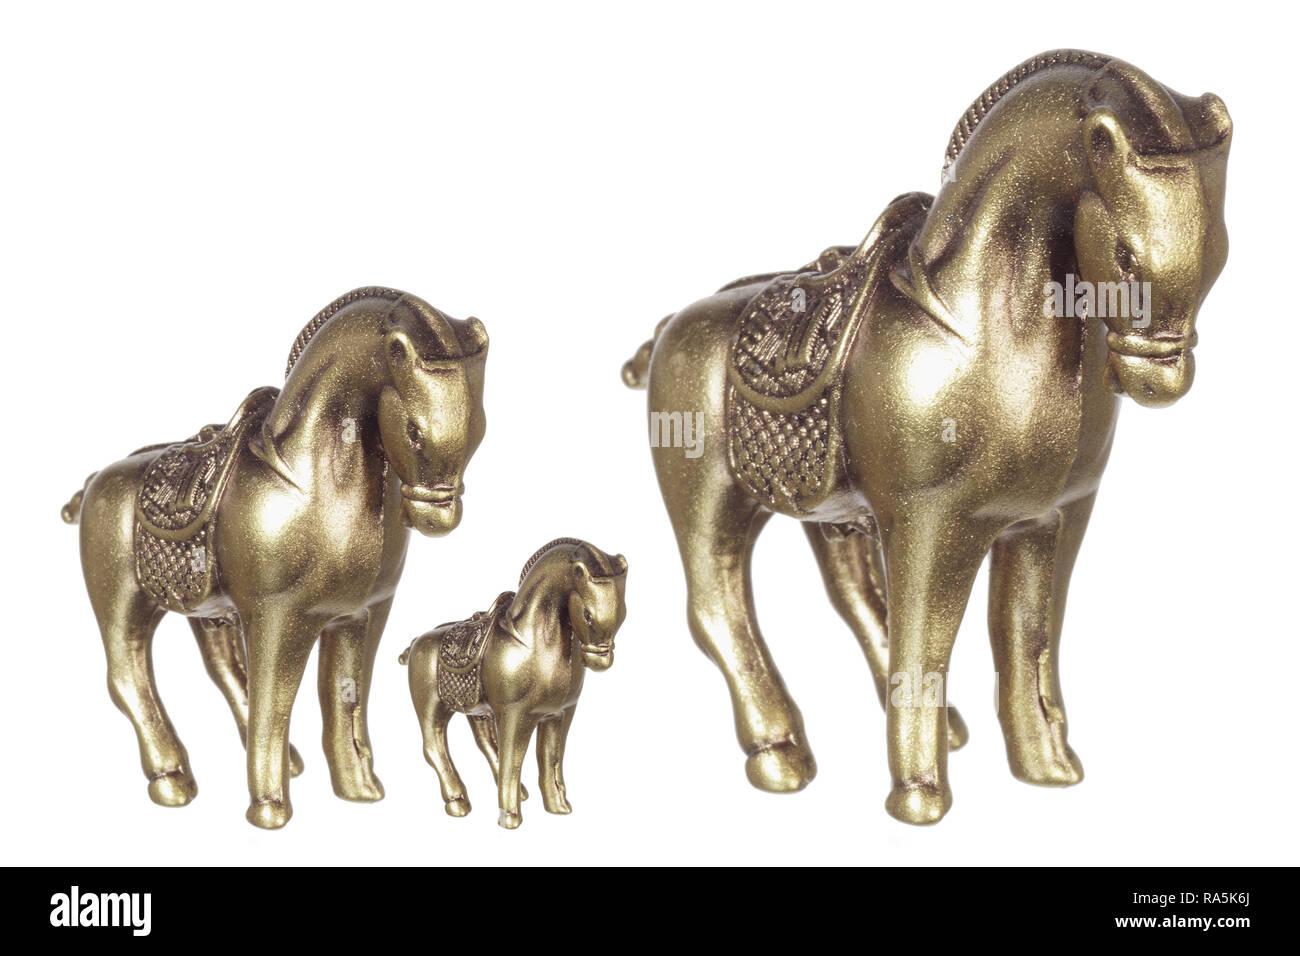 Horse Figurines on White Background Stock Photo